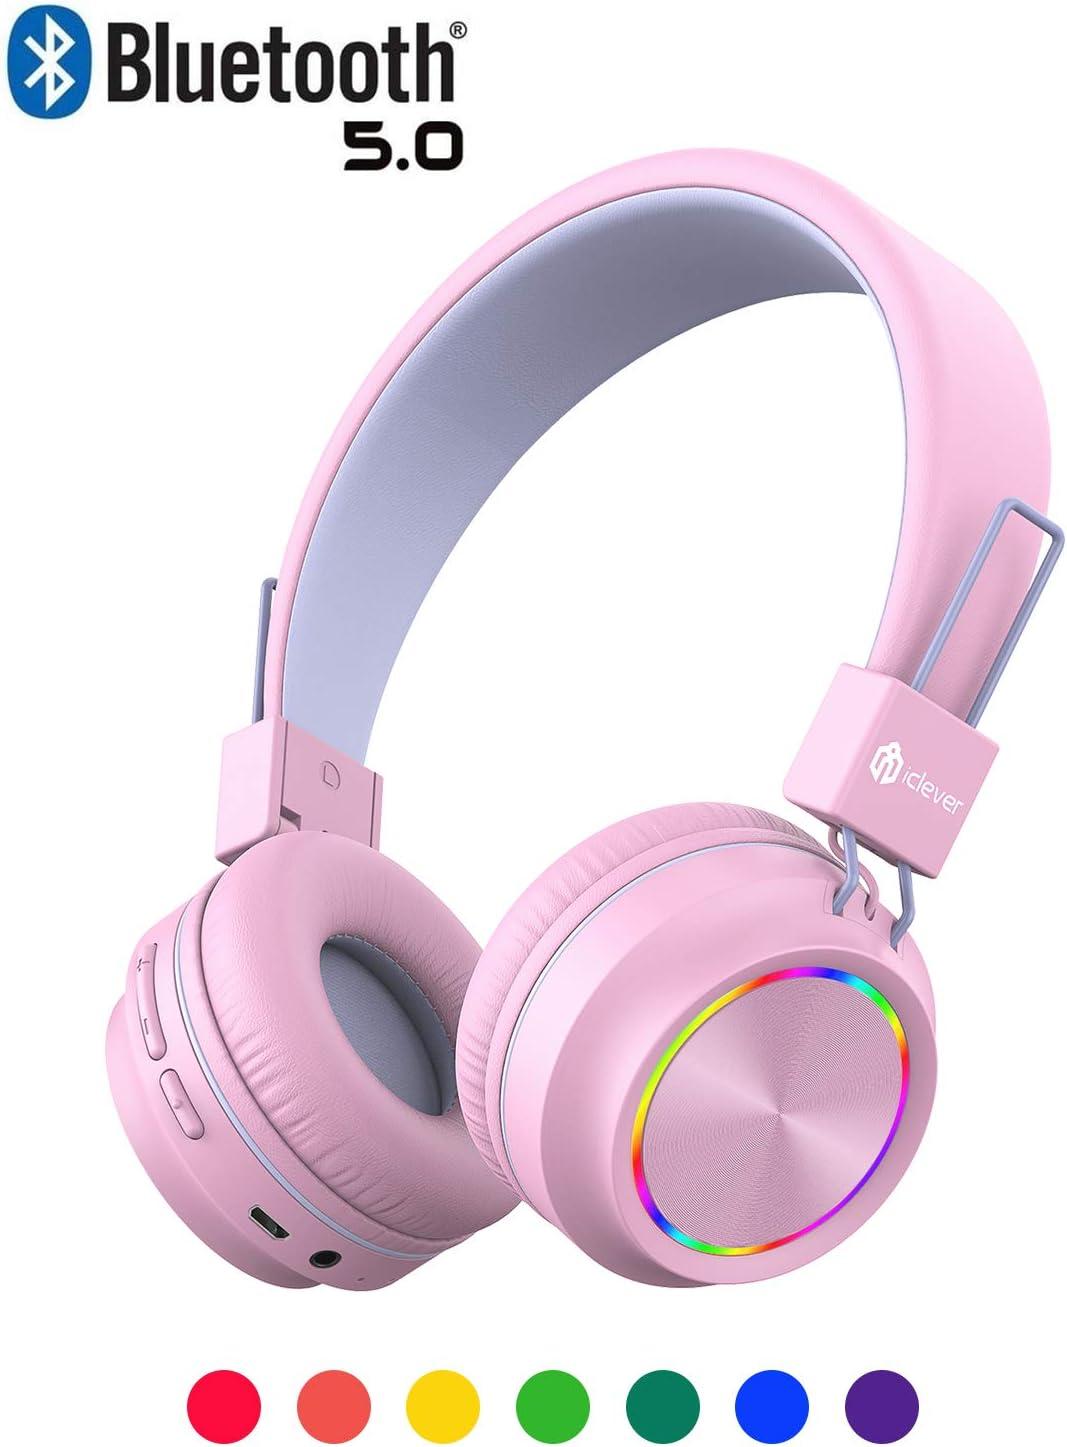 Auriculares led bluetooth 5.0 inalambricos kids rosa